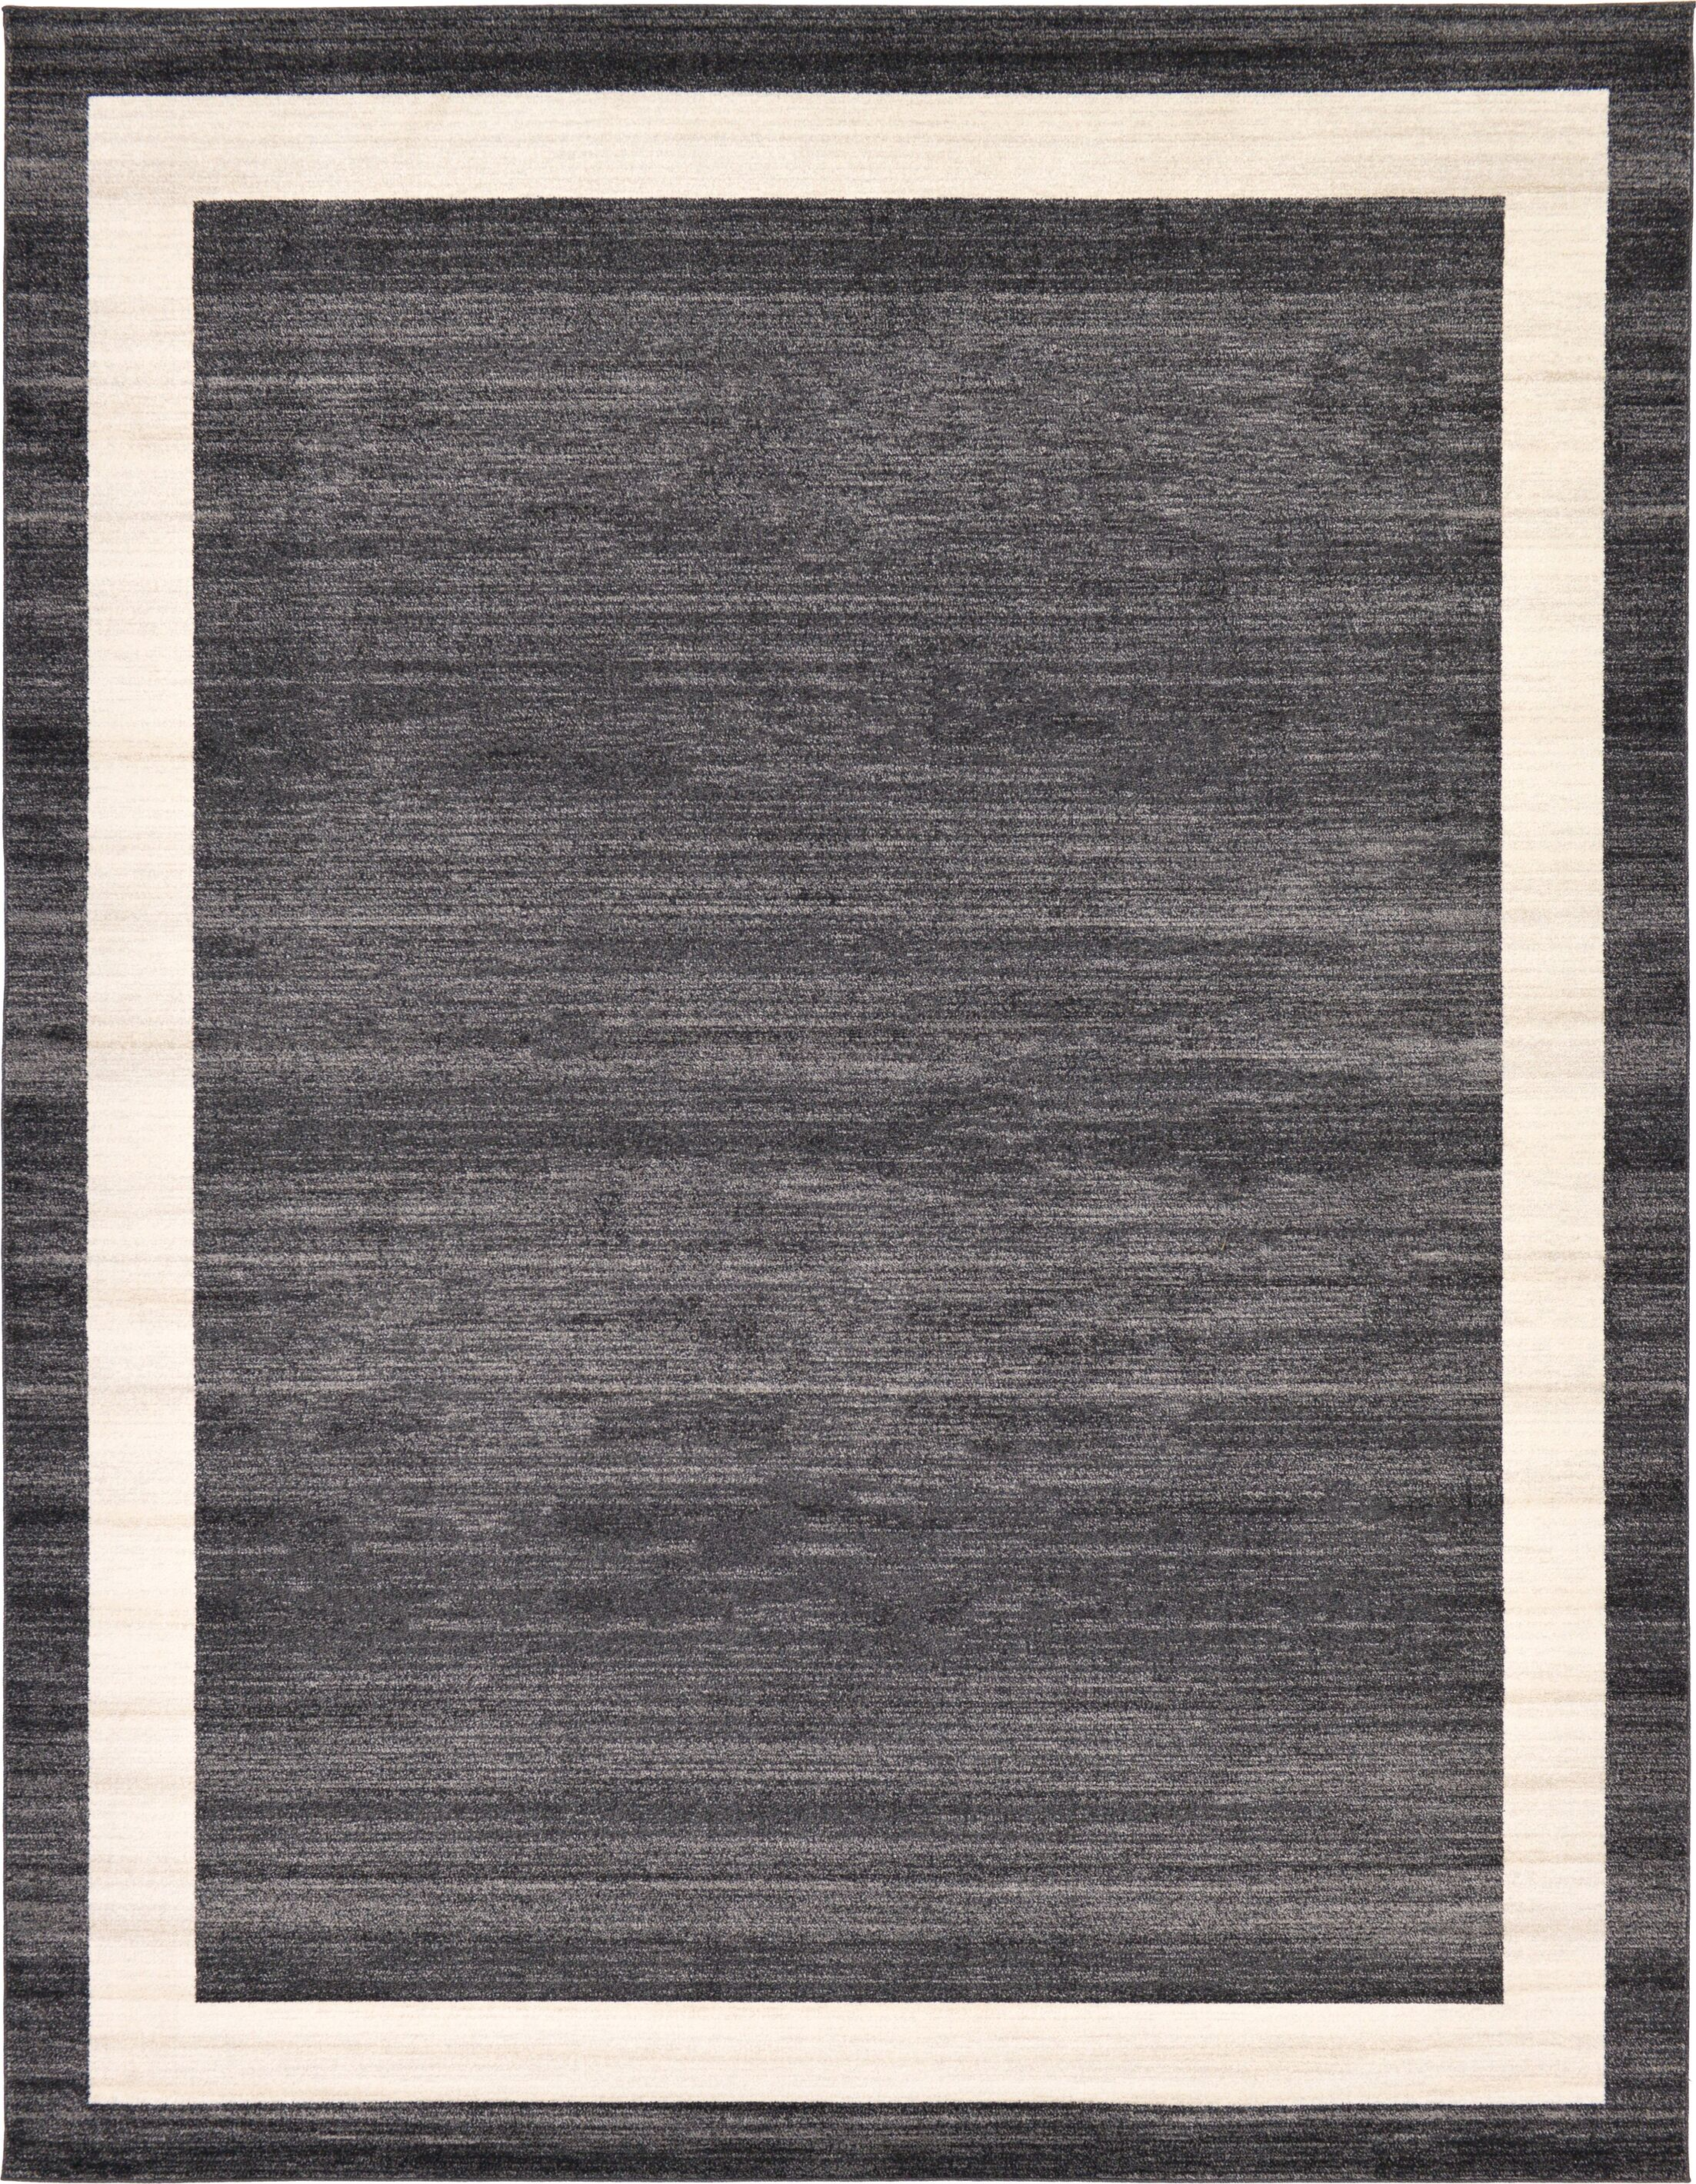 Cregan Black/Cream Area Rug Rug Size: Rectangle 10' x 13'